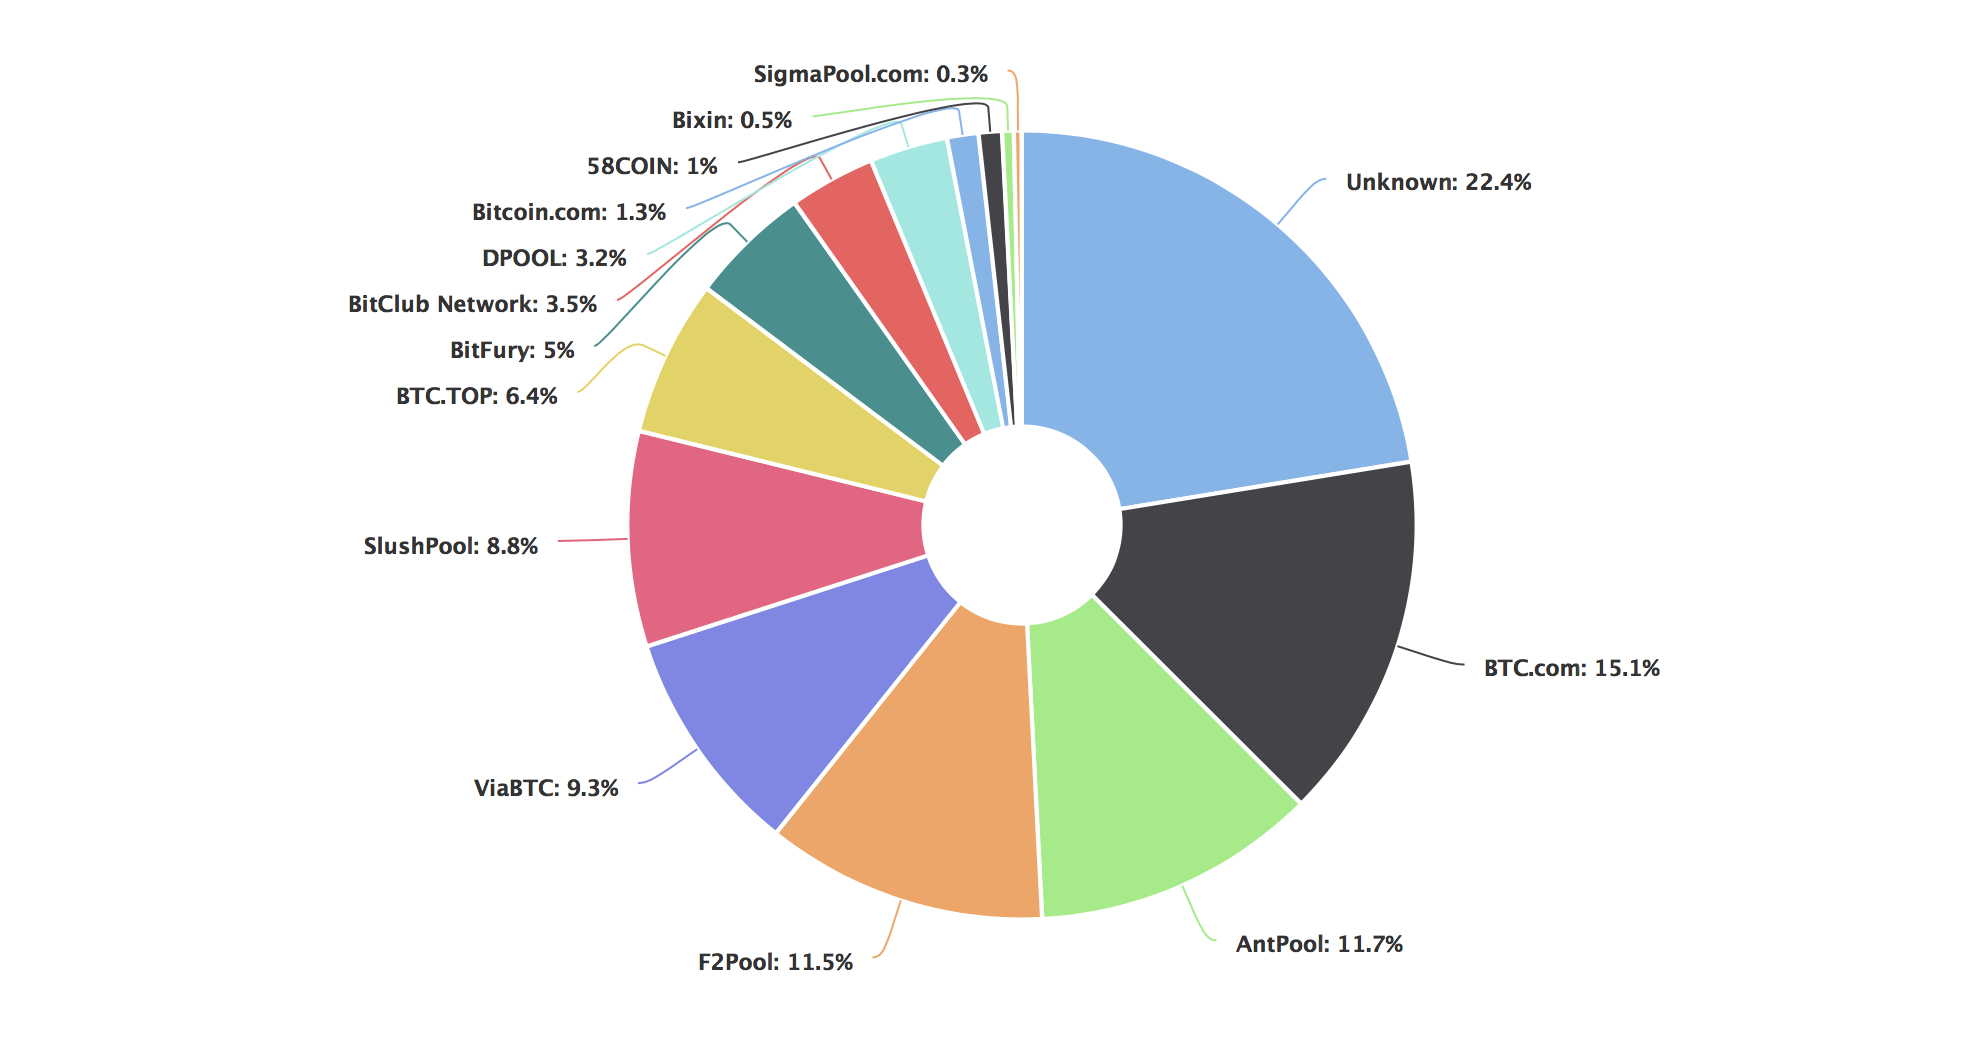 Ethereum Retakes Second Position